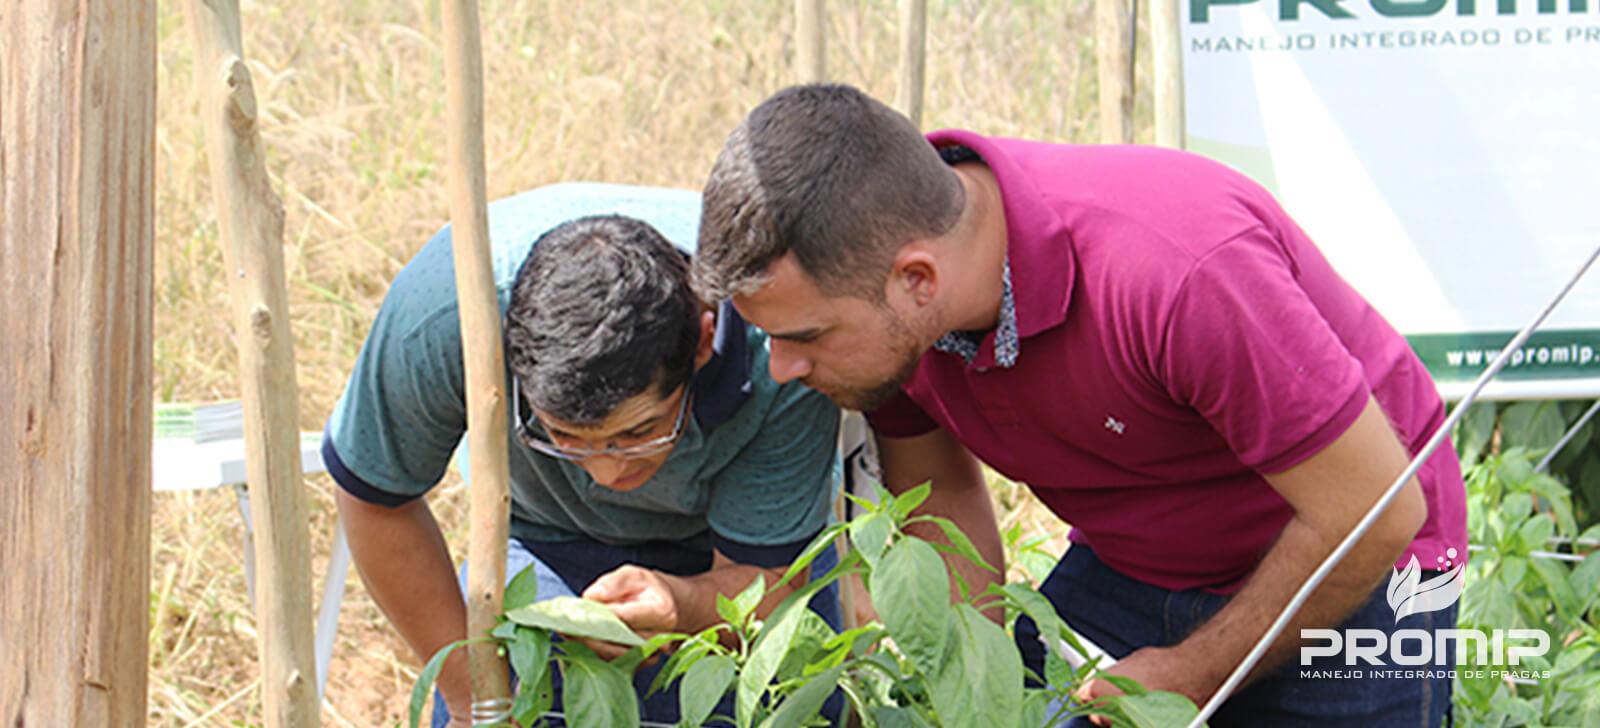 manejo integrado de pragas controle biologico dia de campo desmonstra aos agricultores beneficios controle biologico aplicado